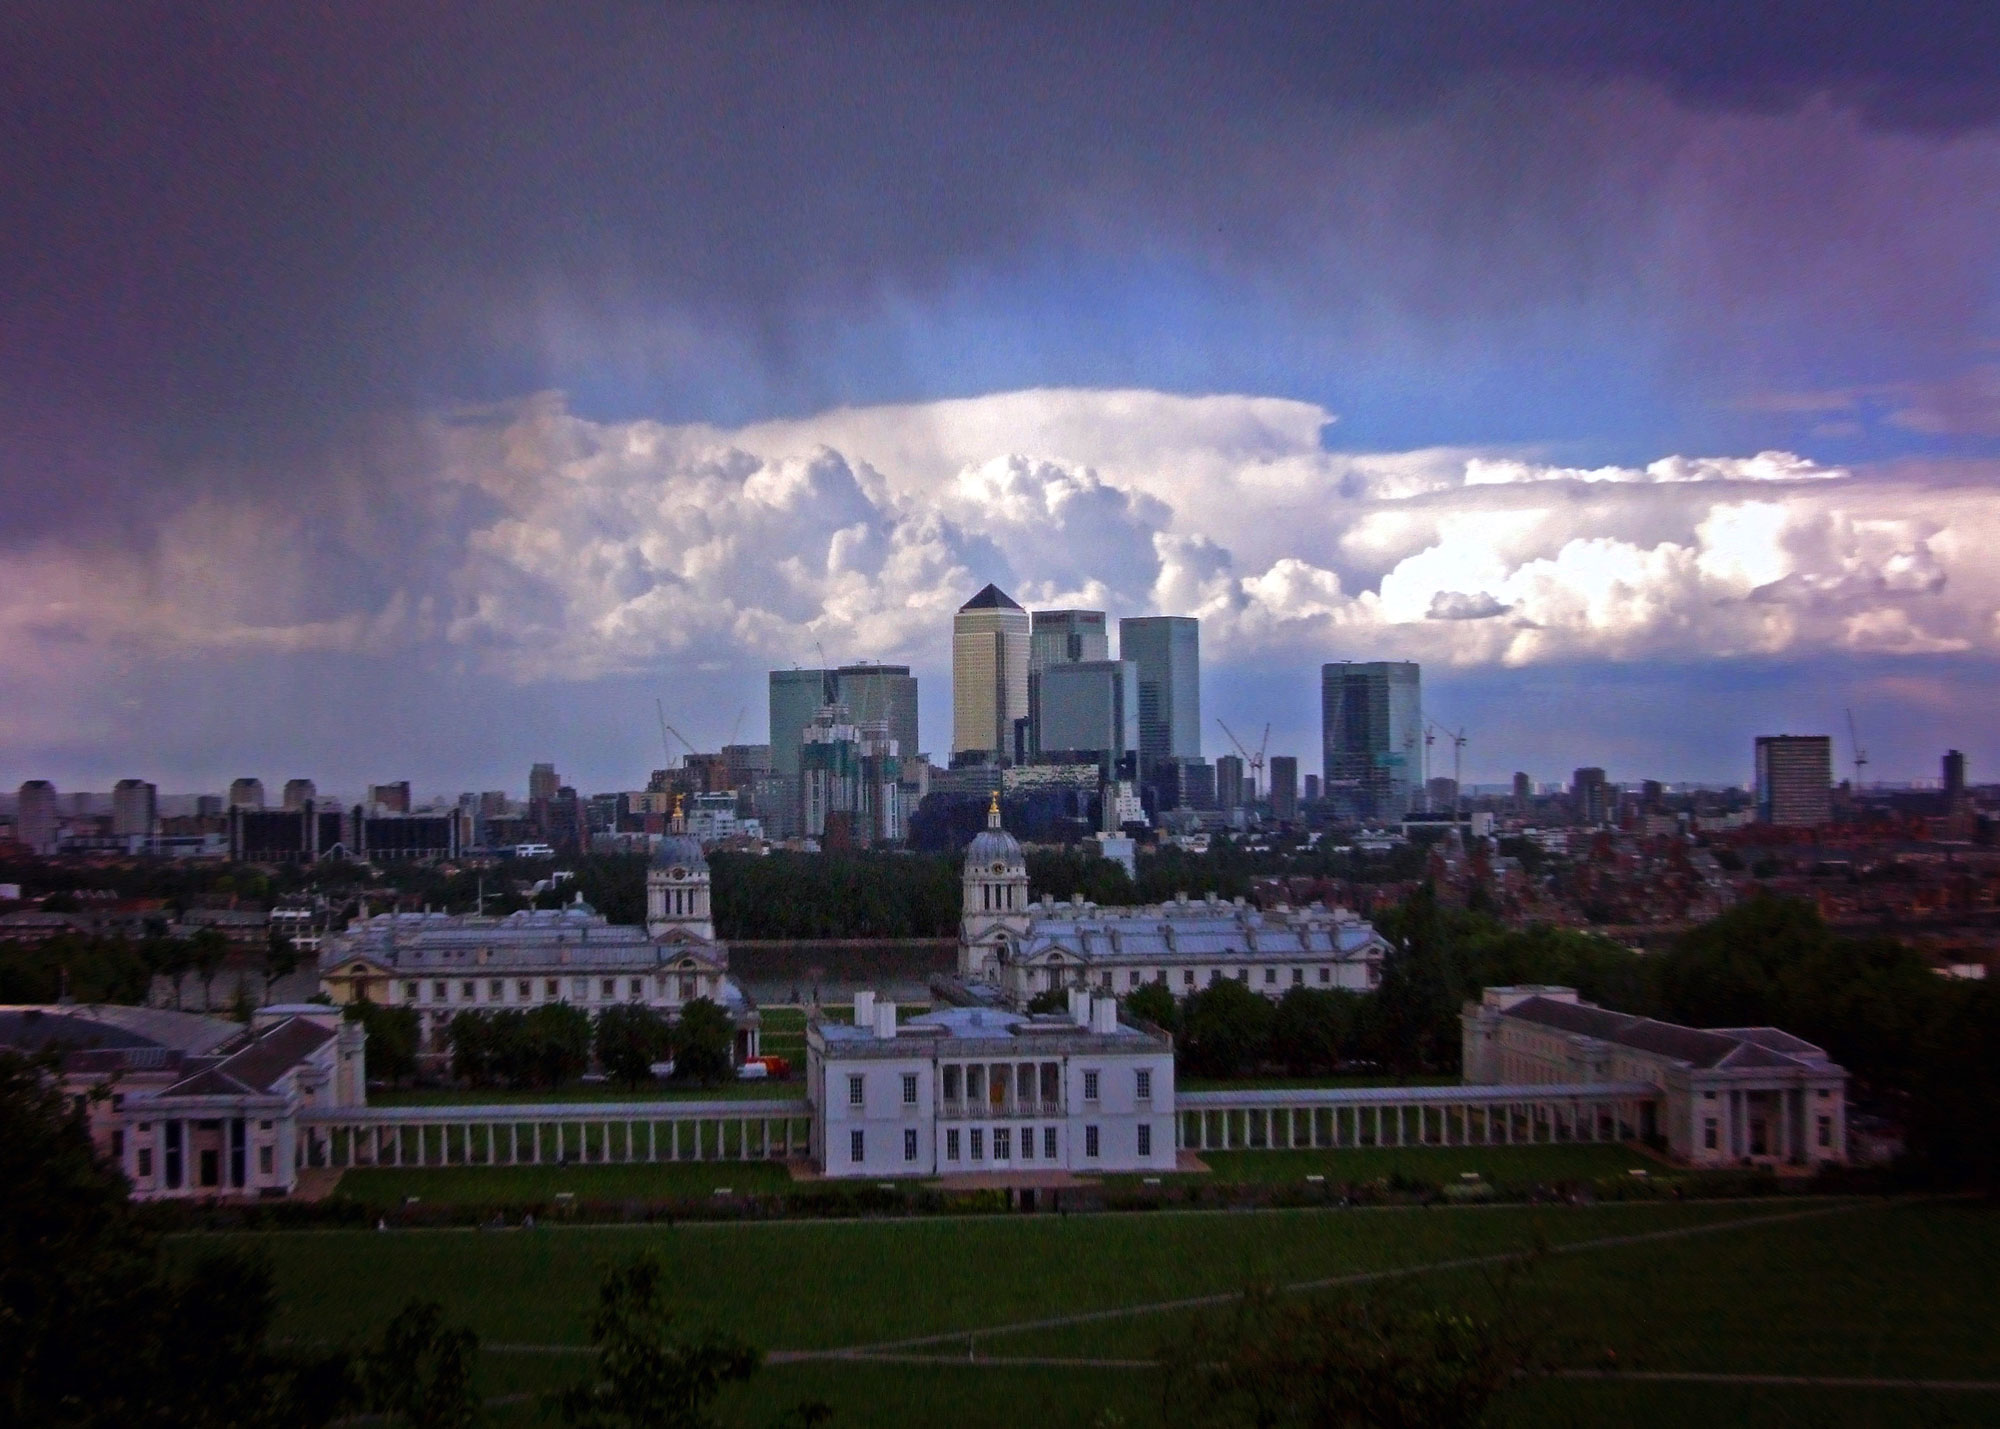 Rain_at_Greenwich,_London